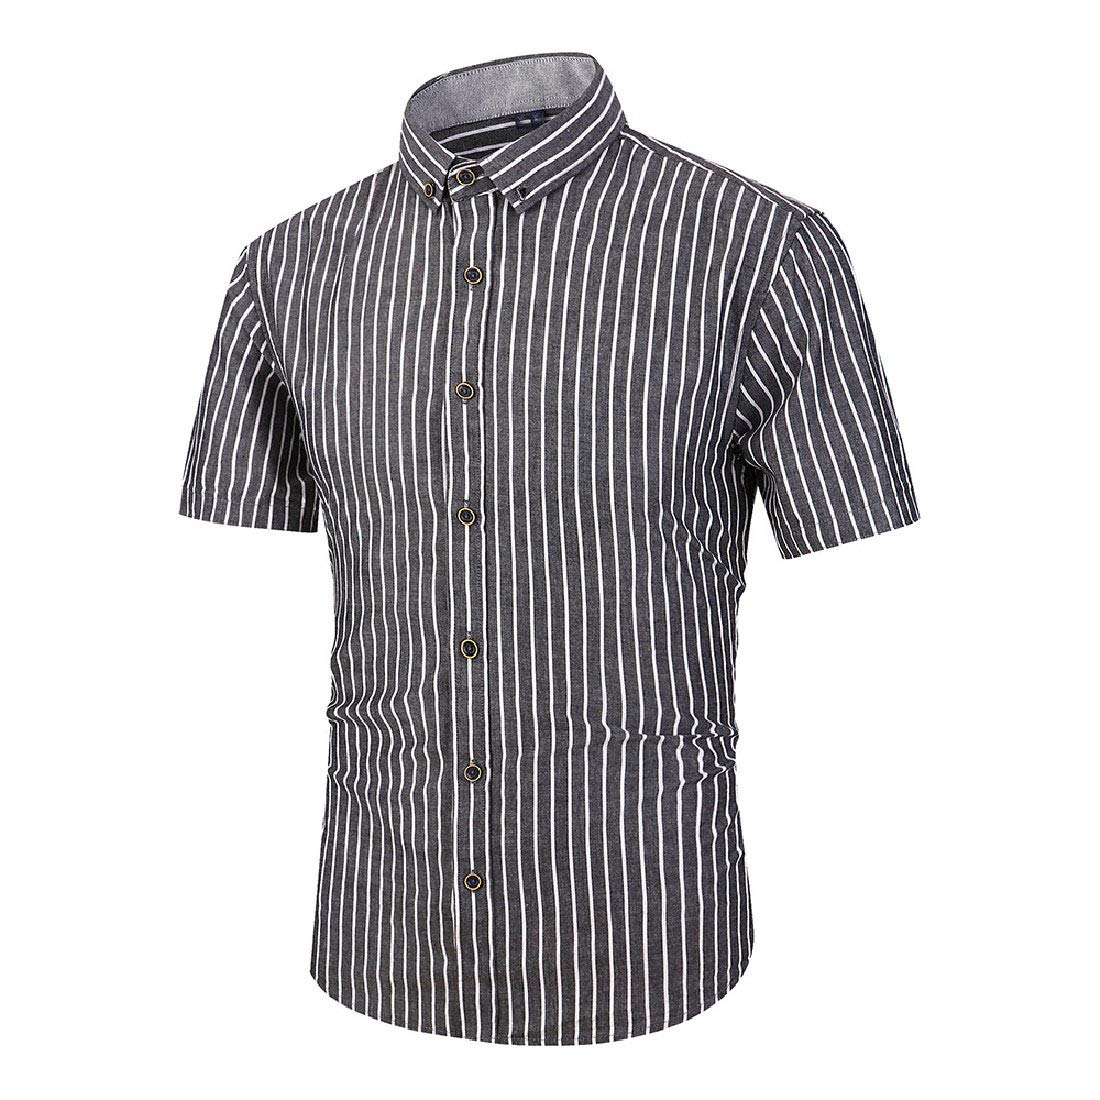 Highisa Mens Flat Collar Striped Casual Short Sleeve Cotton Shirts